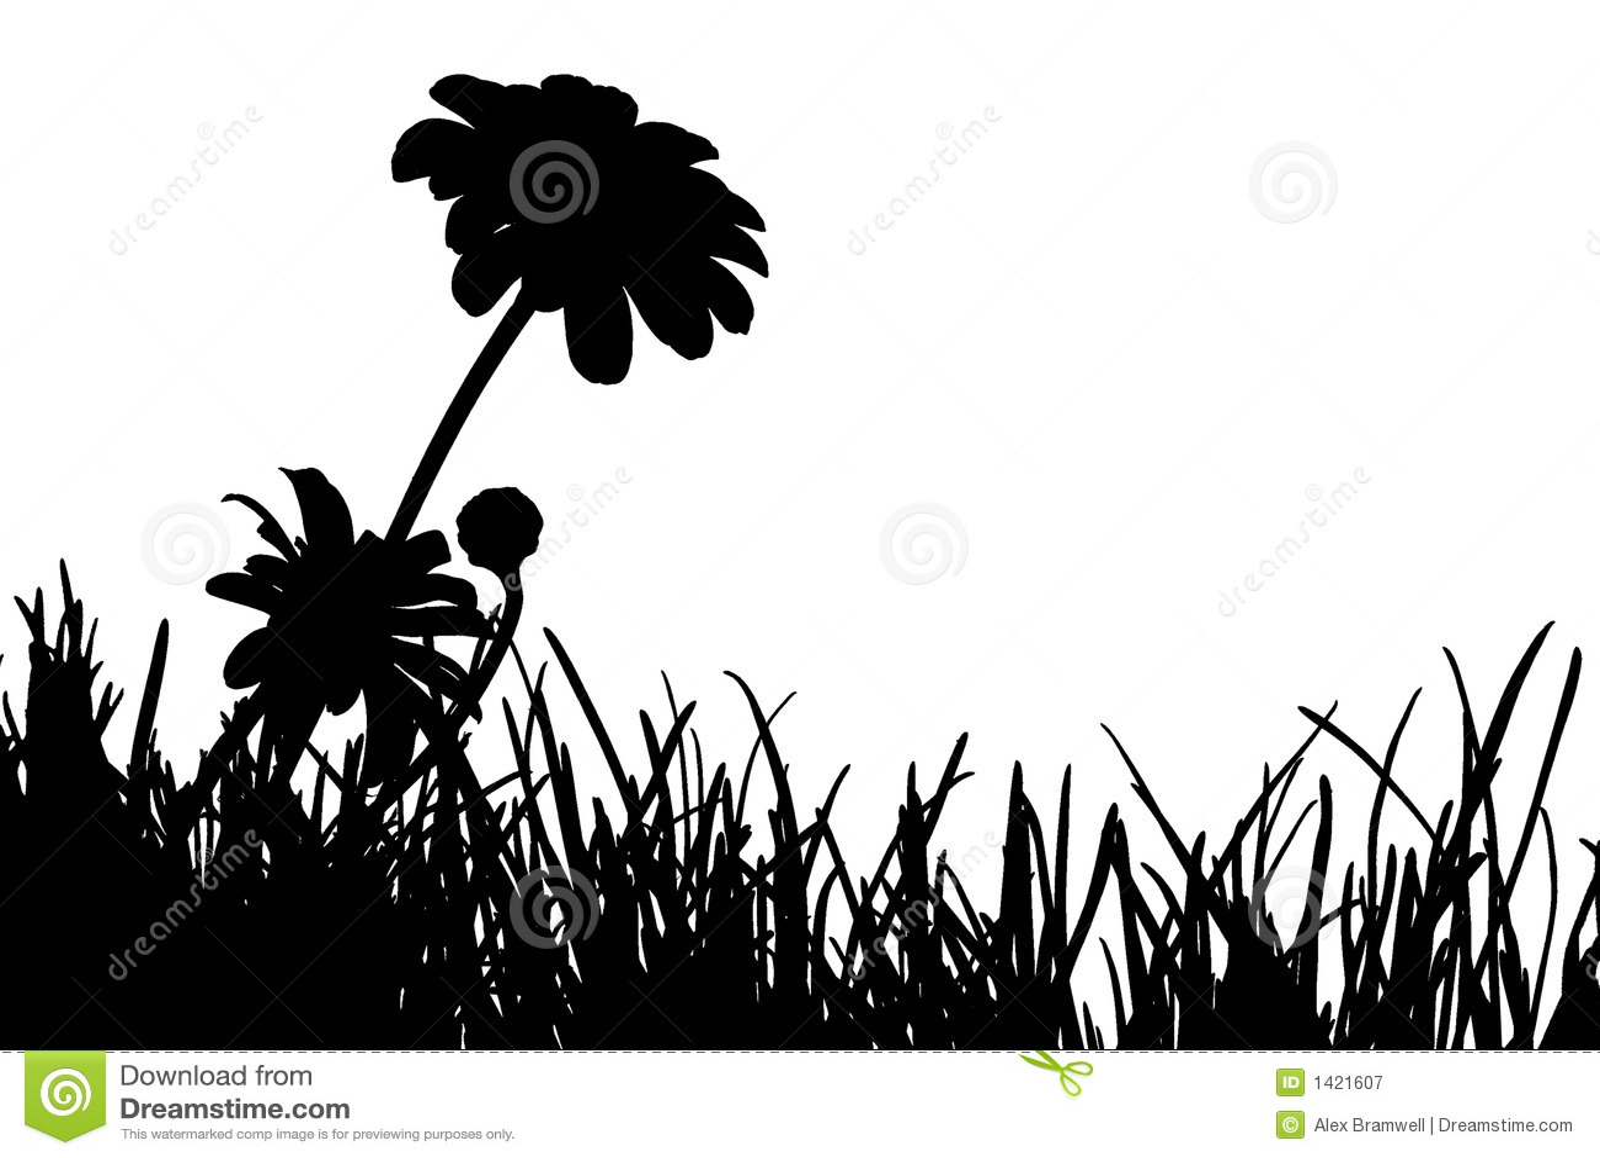 Daisy Silhouette Meadow silhouette